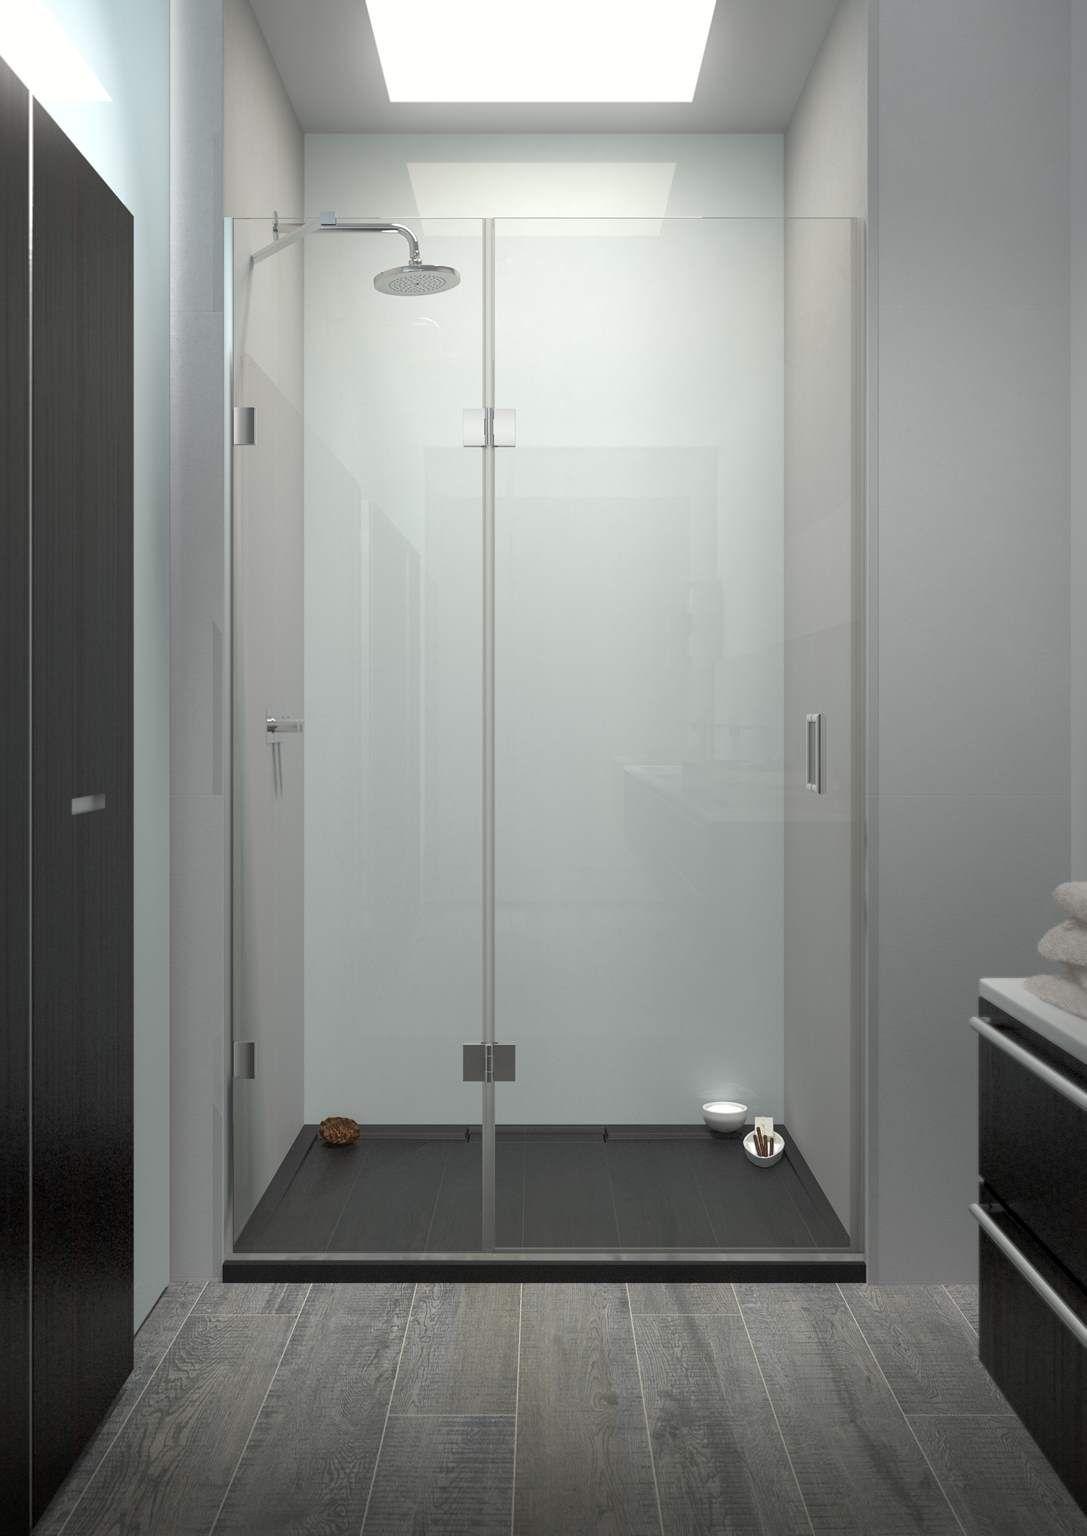 Floor To Ceiling Glass Shower Screen Fermium 04 Inline Panel